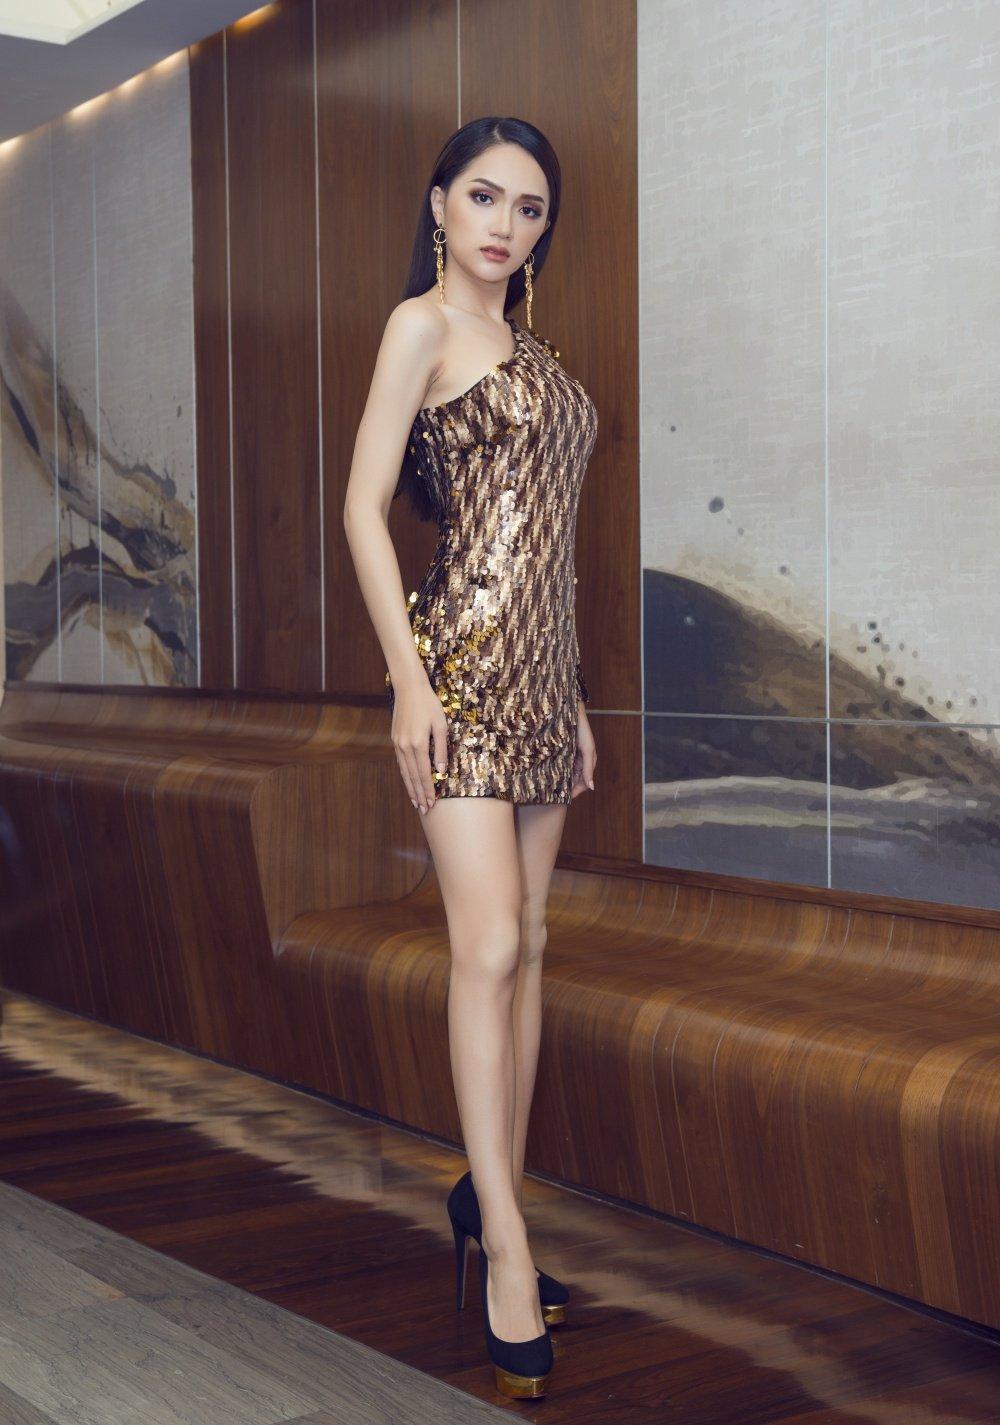 Hoa hau Huong Giang khoe nhan sac xinh dep o Thai Lan hinh anh 1